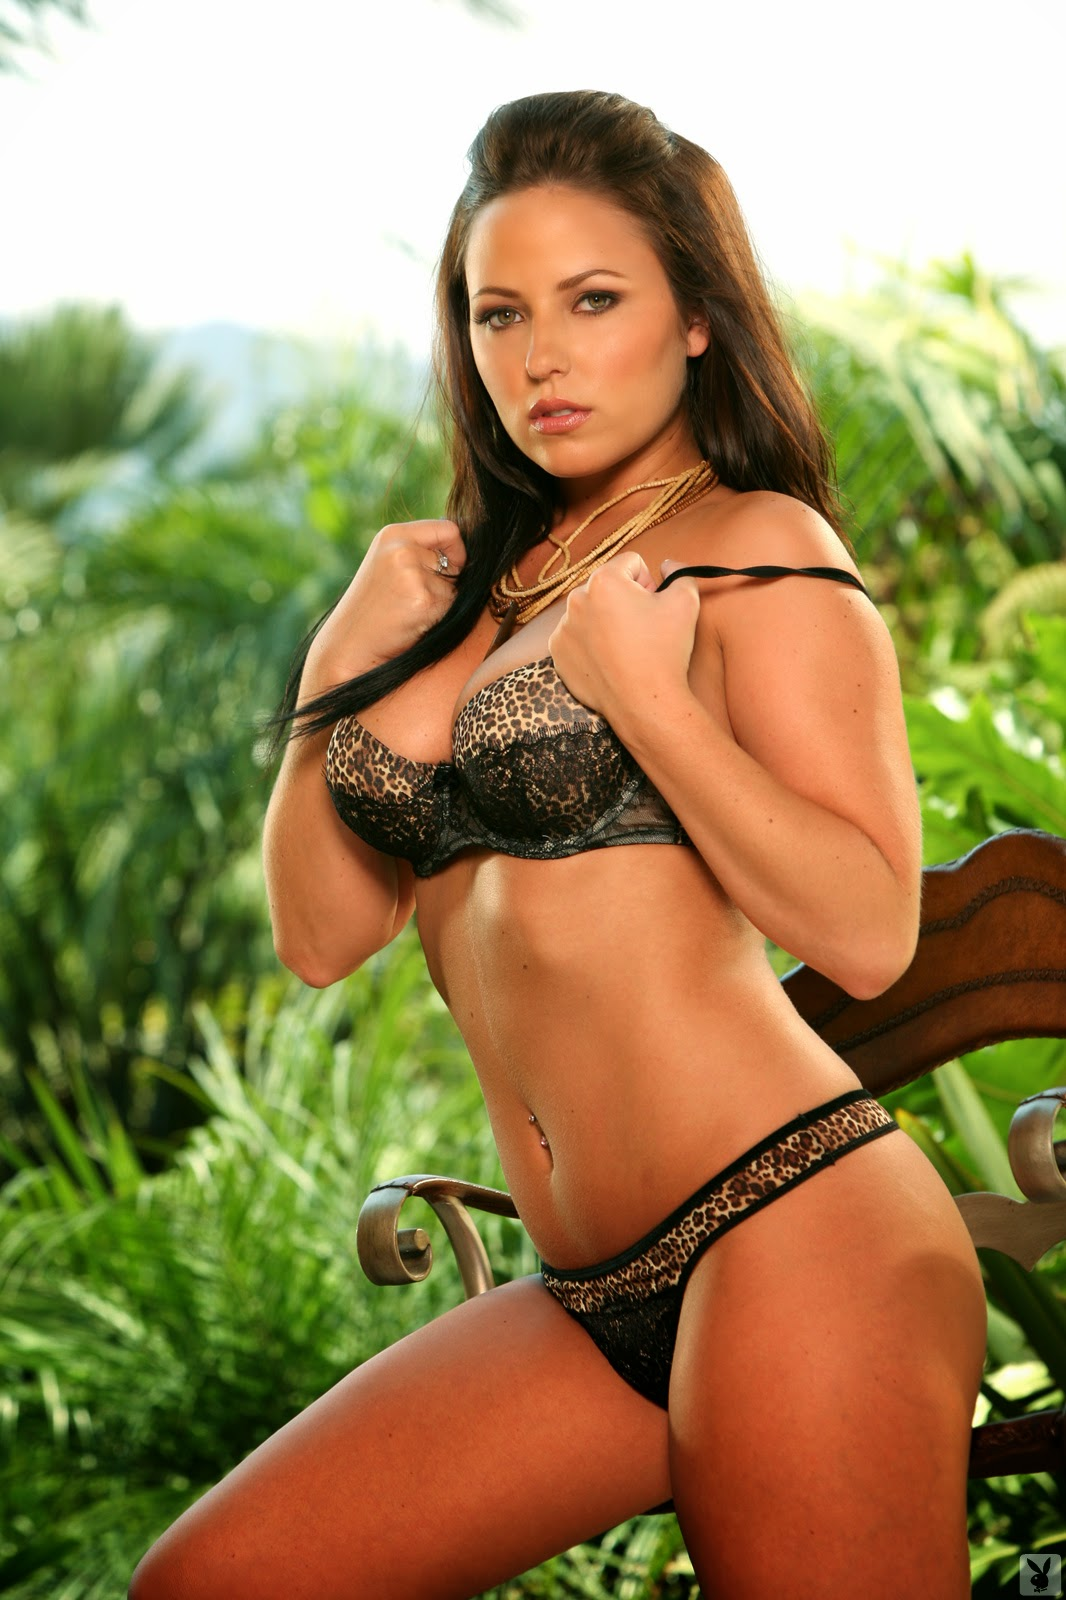 Sarah Scott - Playboy Angels